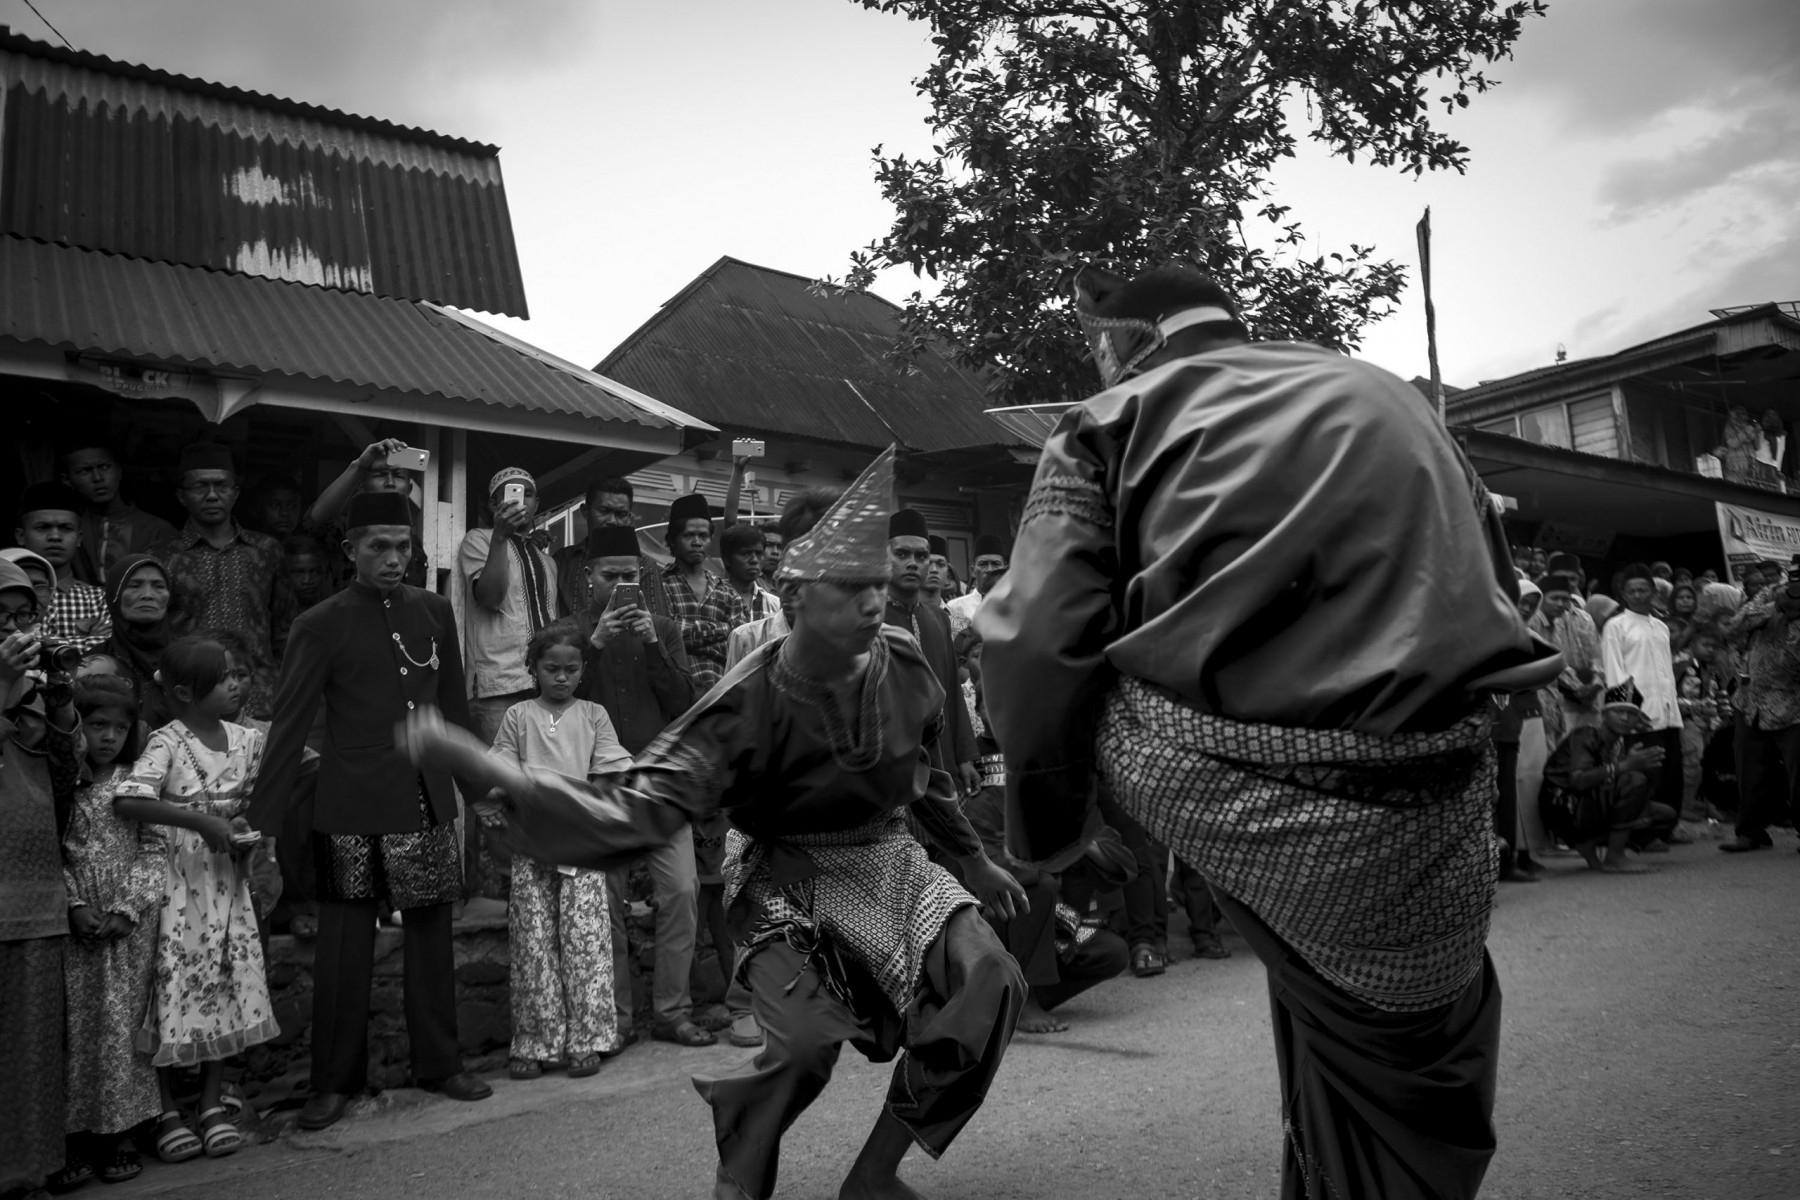 Dua orang pemuda penampilkan pertunjukan silat dalam sebuah upacara adat. Selain sebagai ilmu beladiri, silat juga berkembang sebagai tontonan dan hiburan. Namun, sesungguhnya pada level ini, gerakan yang ditampilkan hanya gerakan yang memiliki estetika keindahan saja.